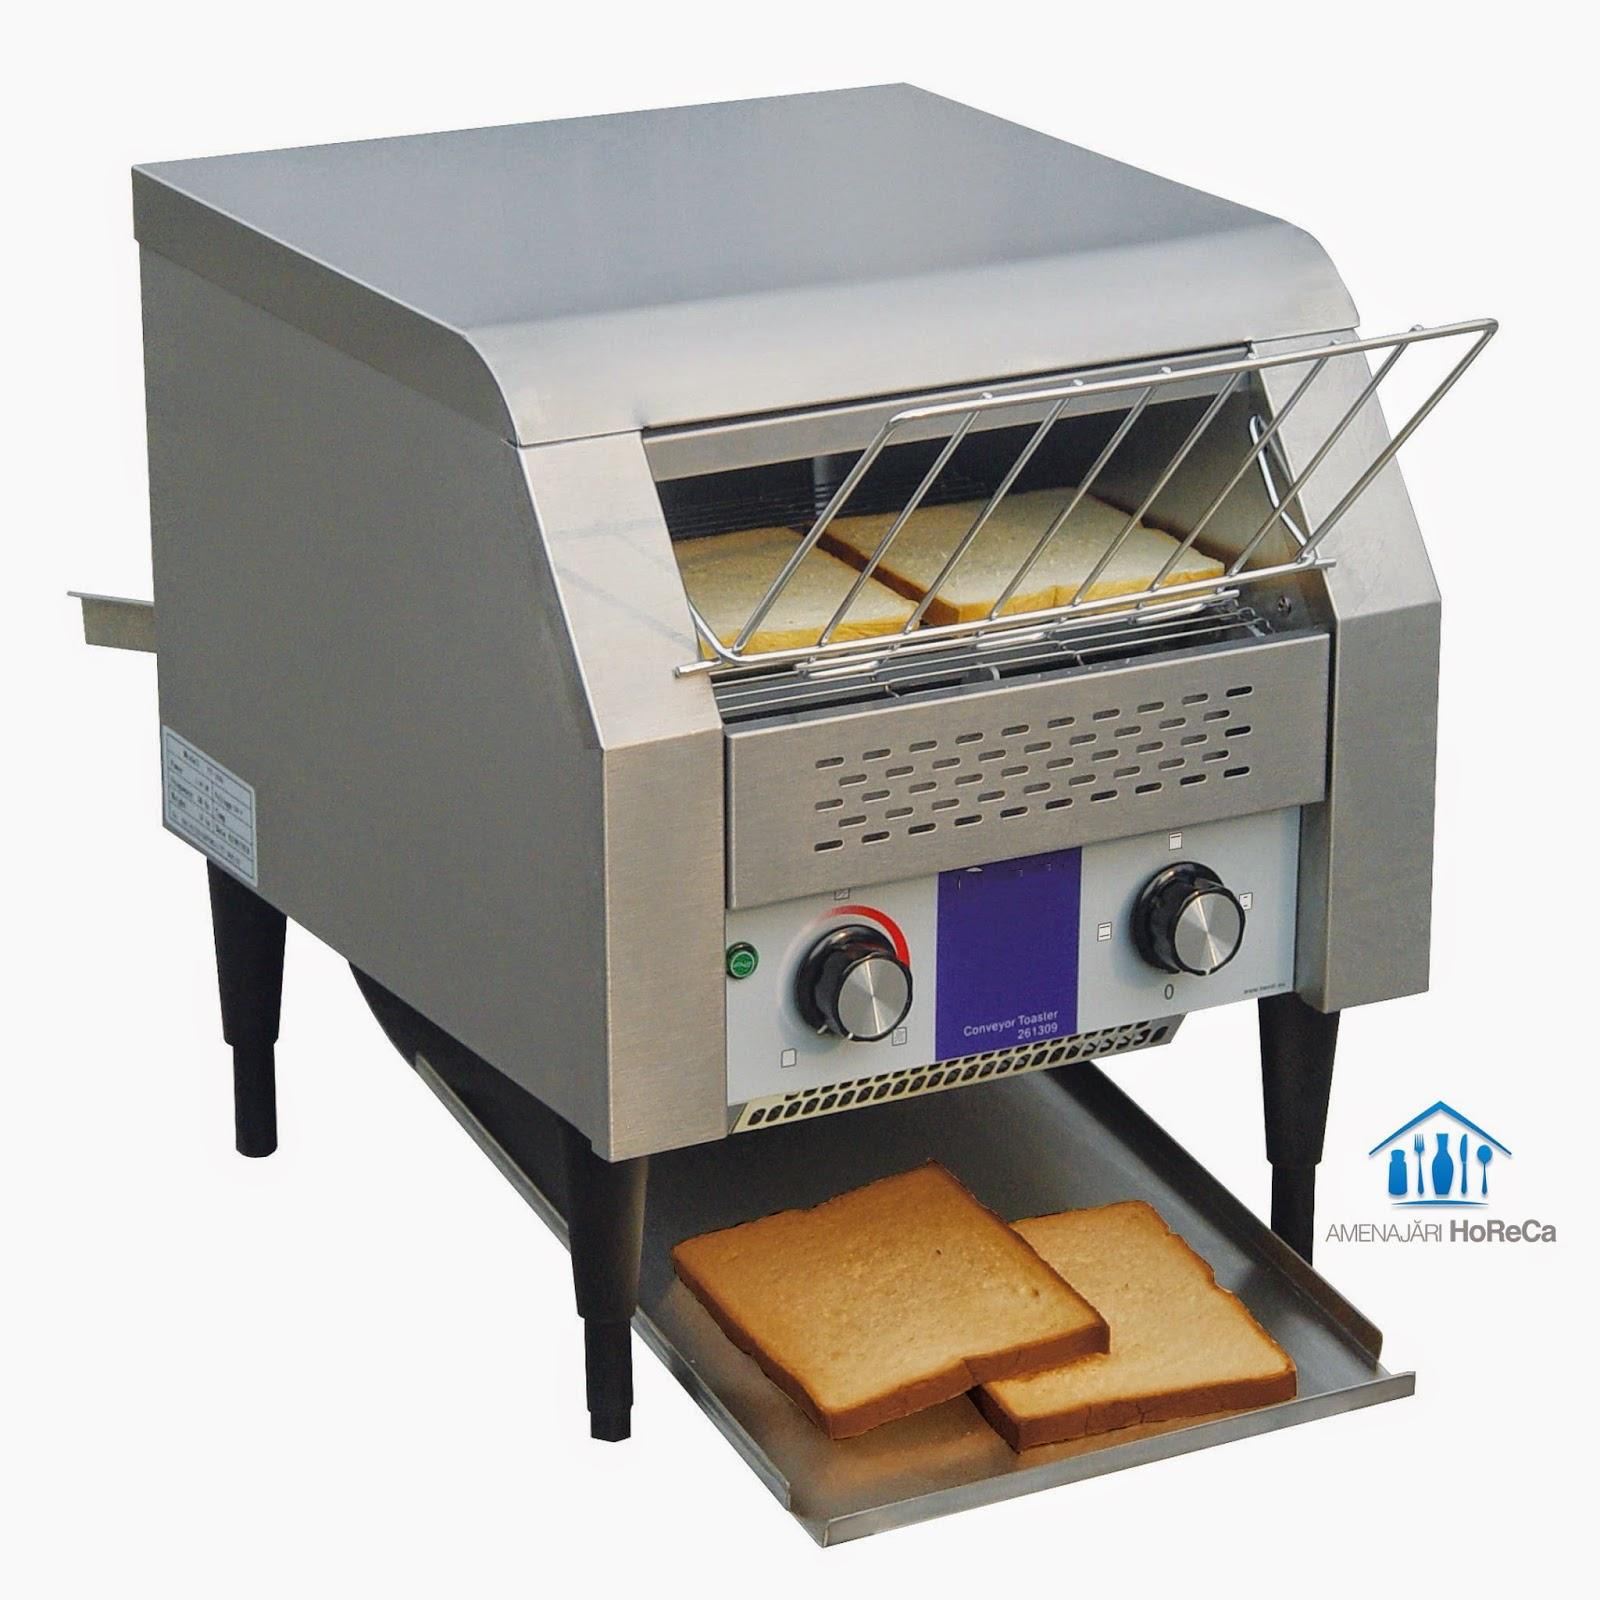 Toaster Tunel, Toaster Profesional, Toaster Horeca, Prajitor Paine, Pret Toaster Profesional